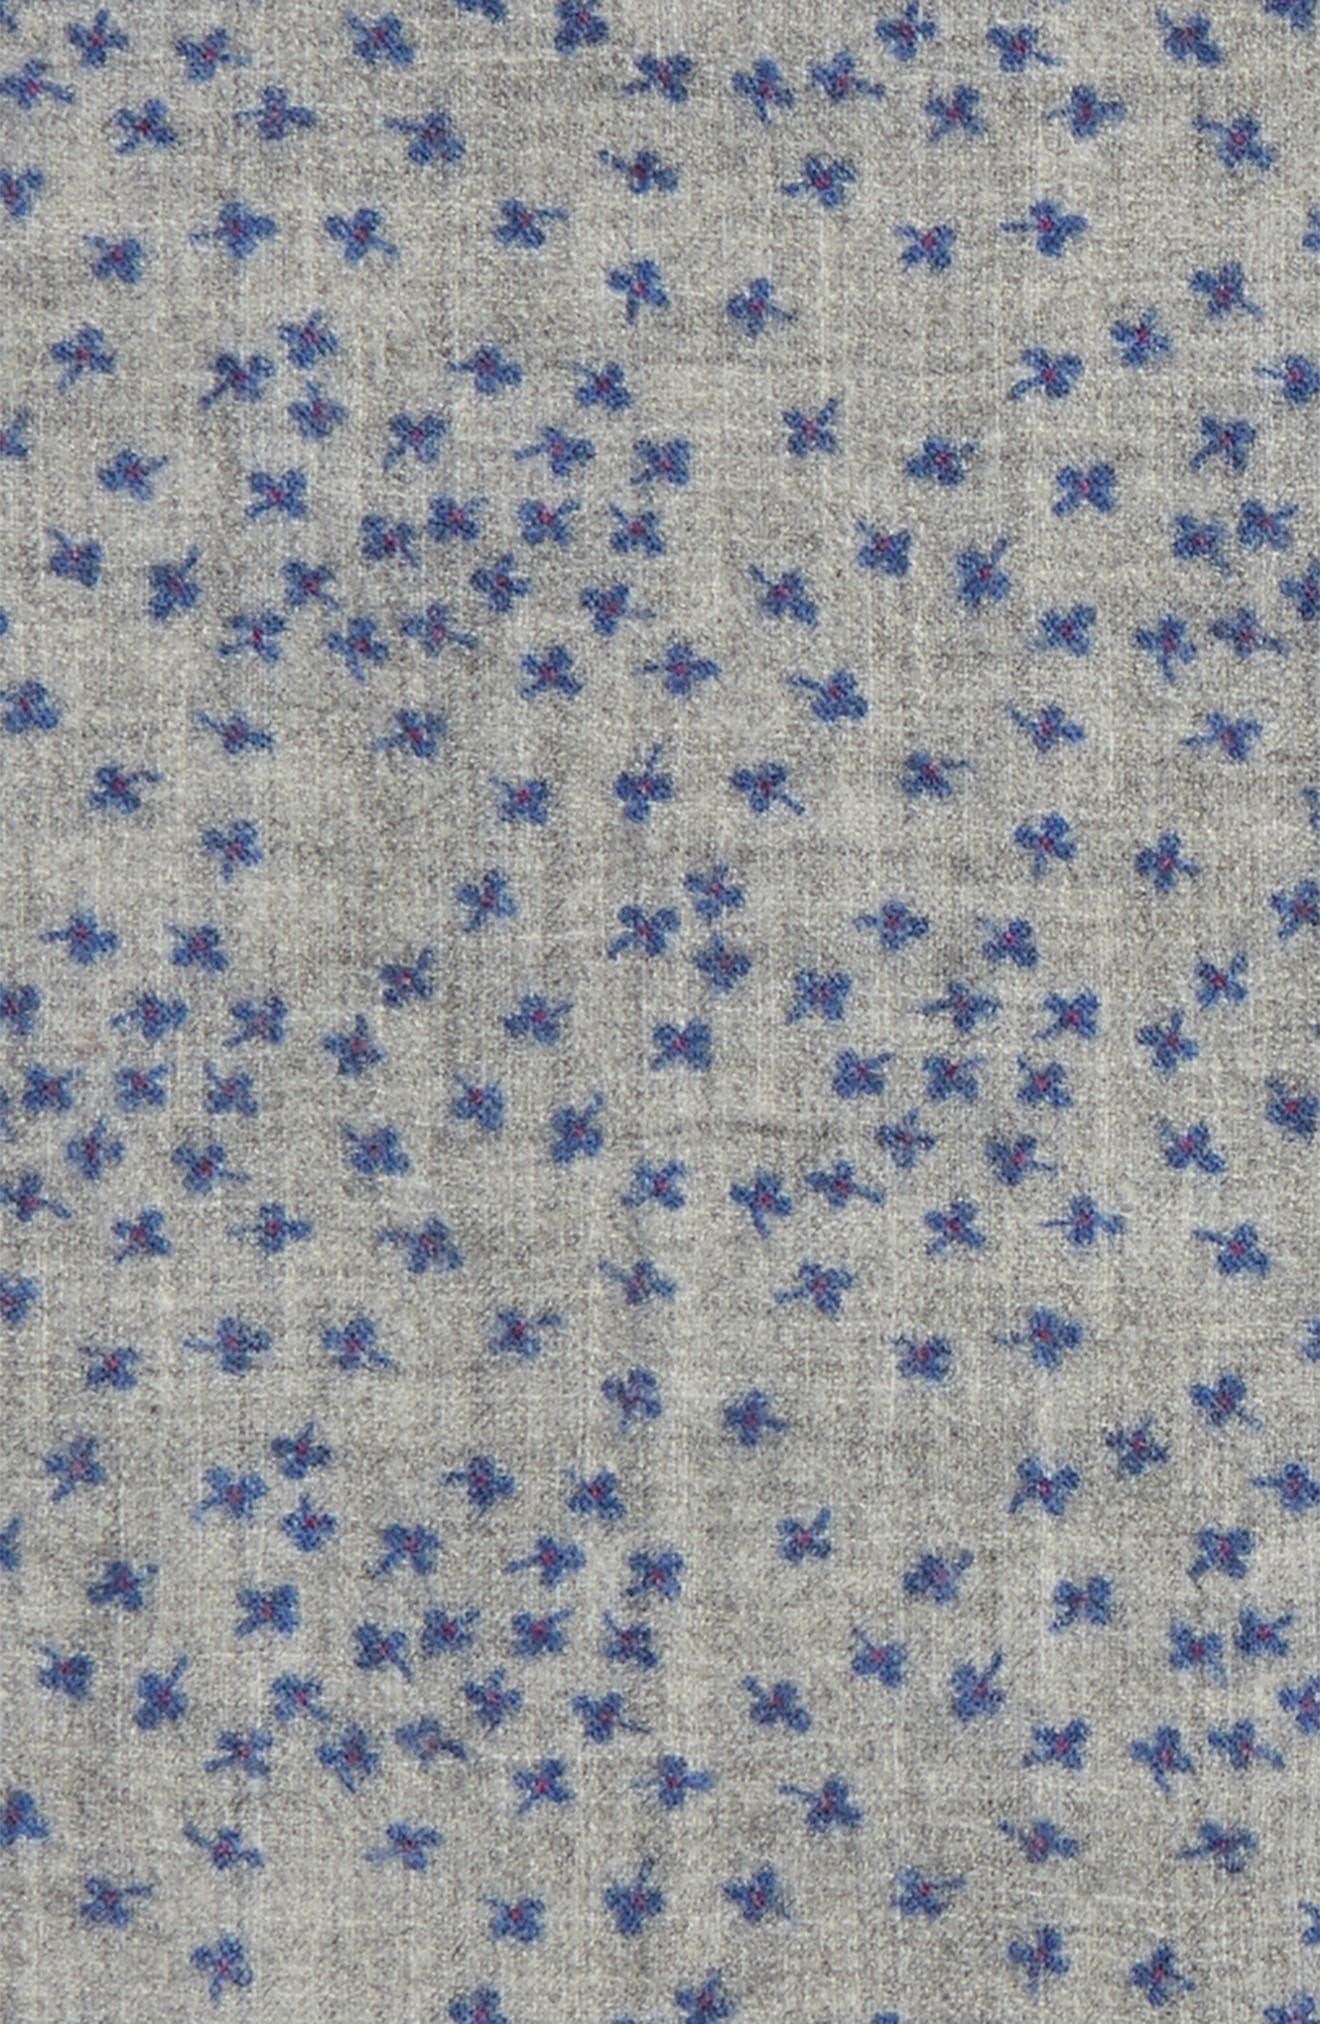 Patterned Wool Pocket Square,                             Alternate thumbnail 3, color,                             020